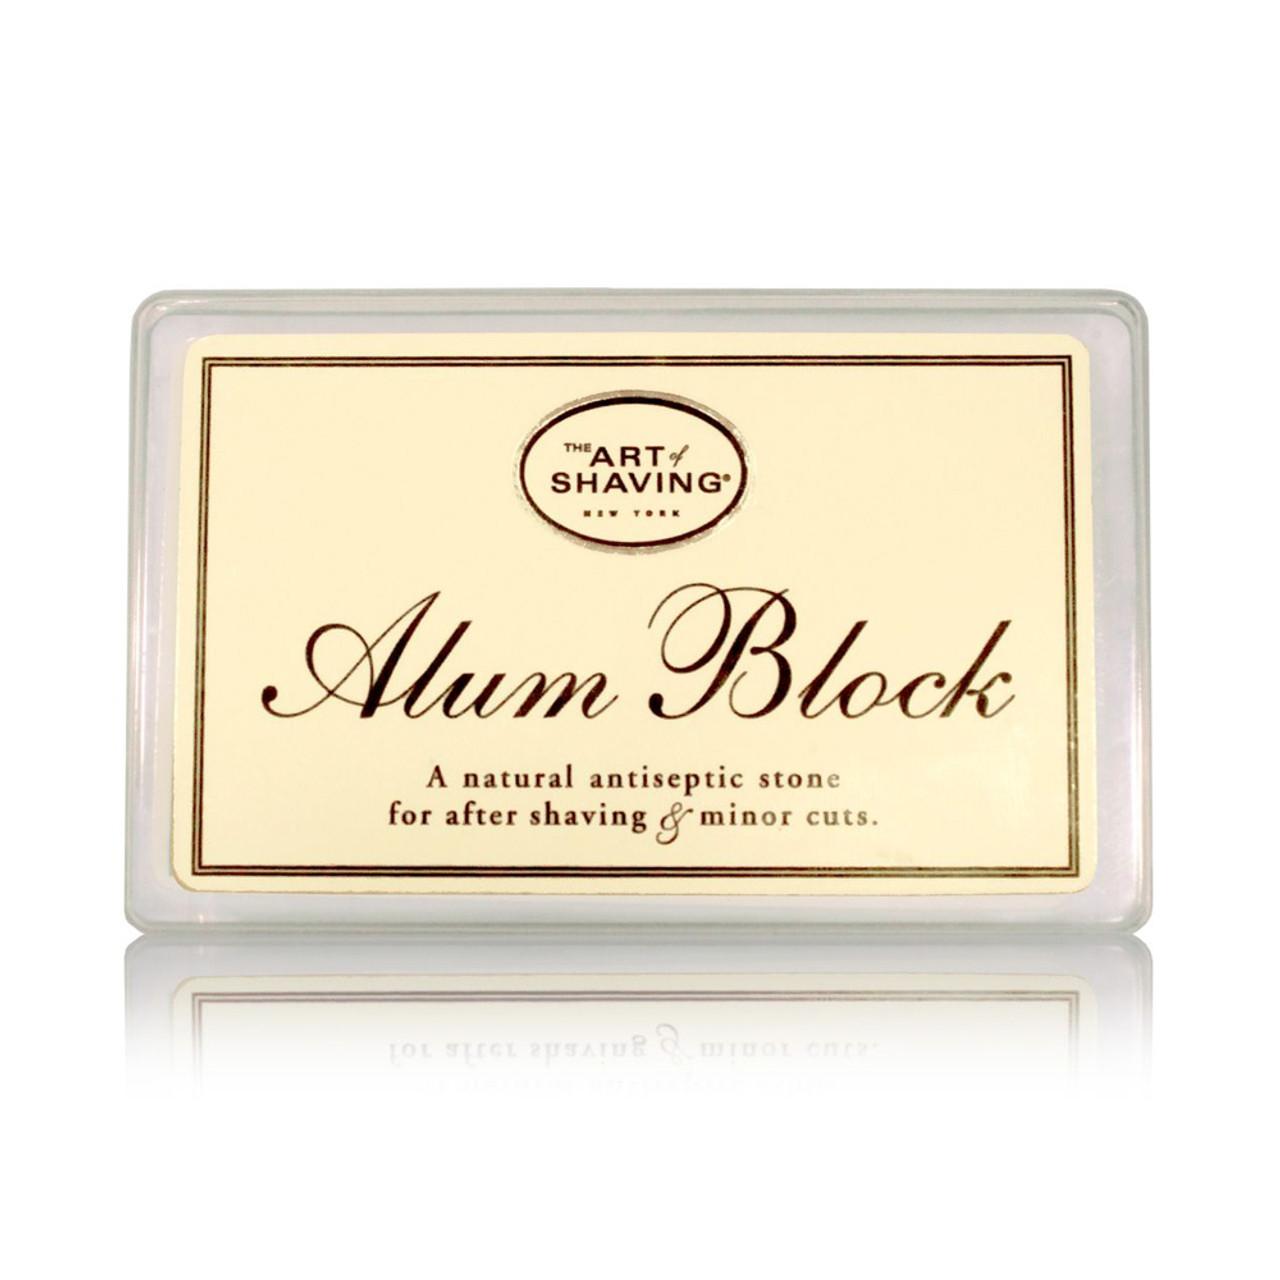 The Art of Shaving Alum Block